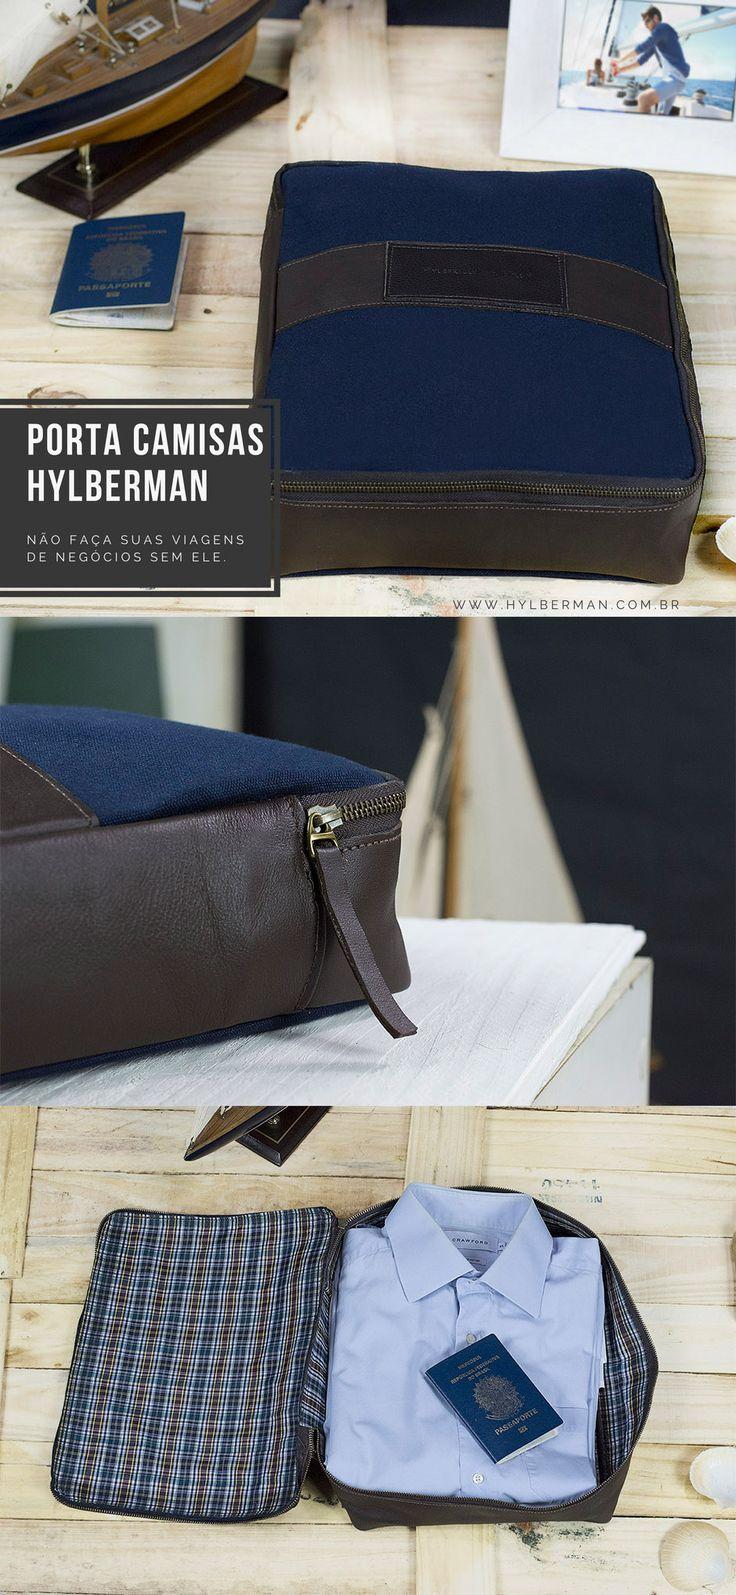 Porta camisas da Hylberman. Para o homem que vai longe, mas vai elegante. #hylberman #portacamisa #couro #lona #homemmoda